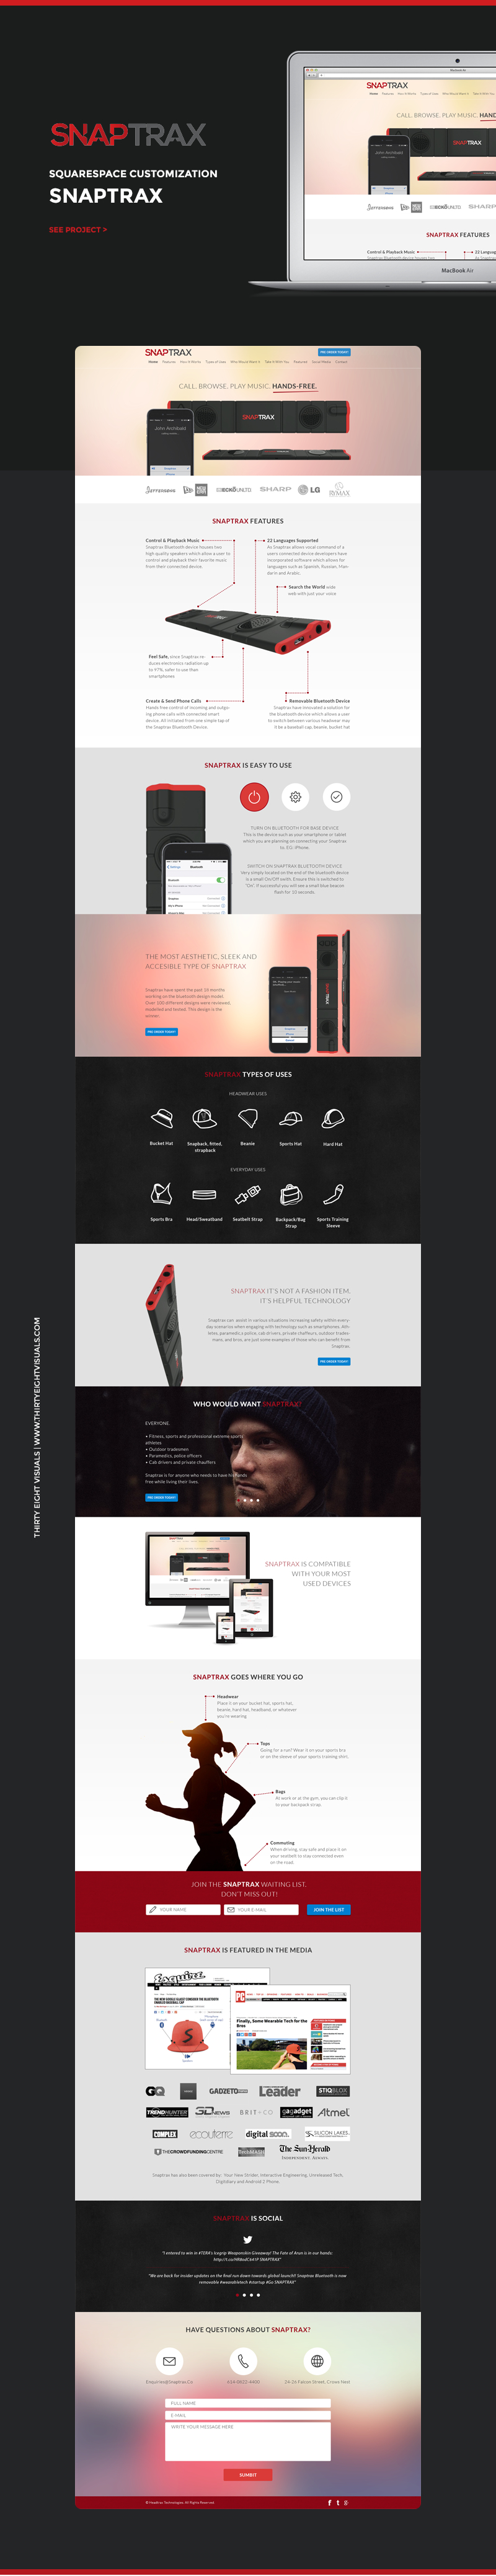 Snaptrax mockup design.jpg